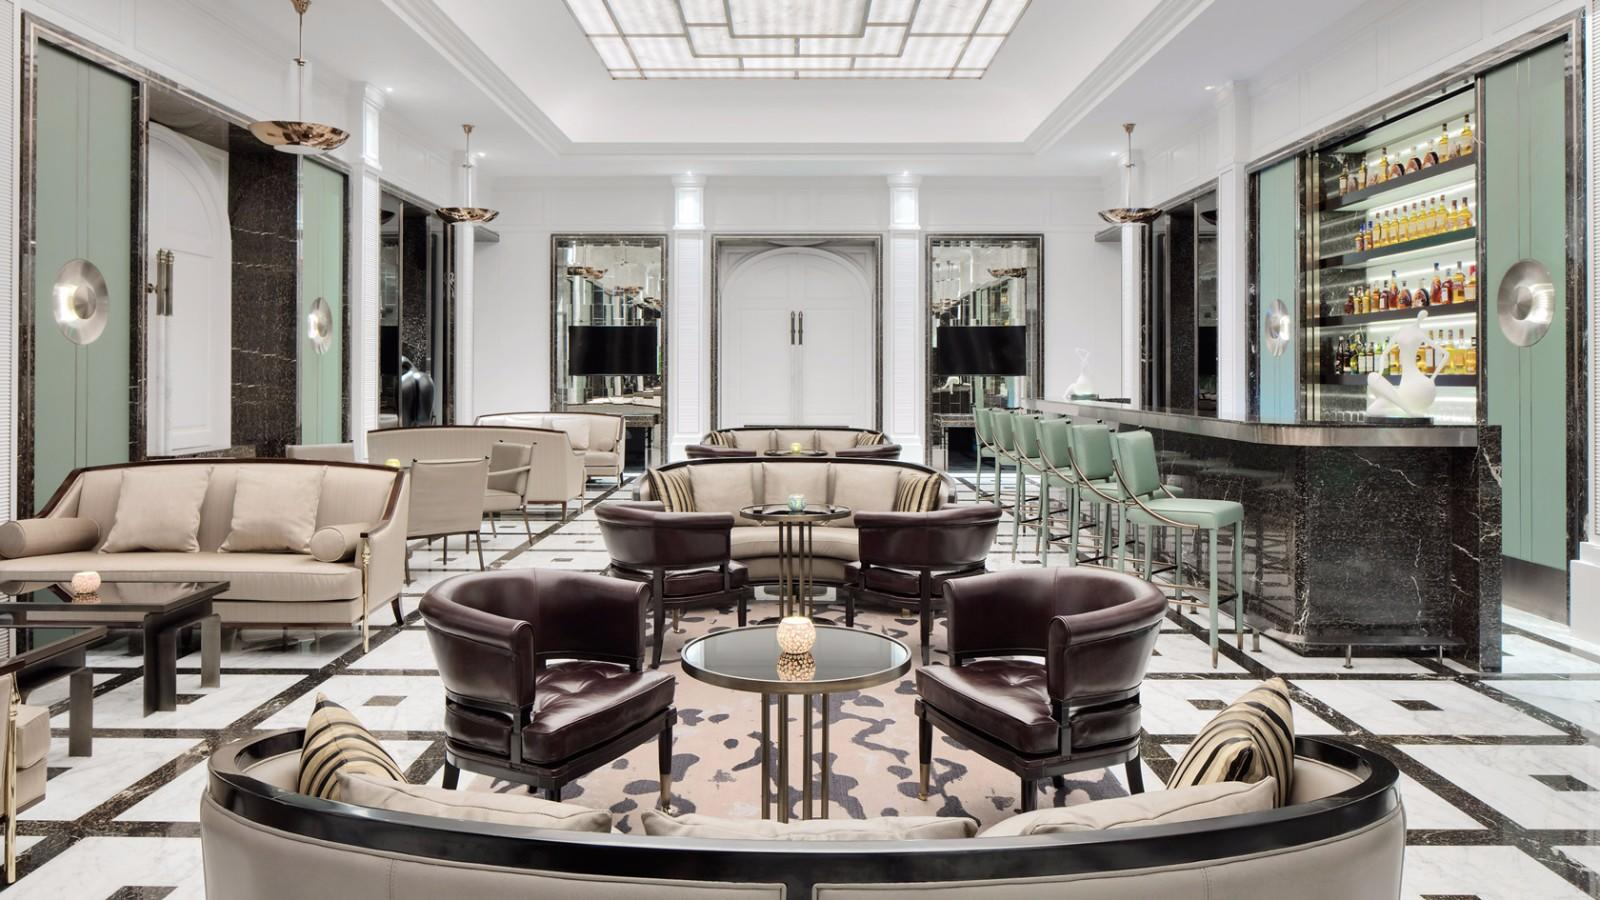 High End Contract Golf Club Casino Furniture-1